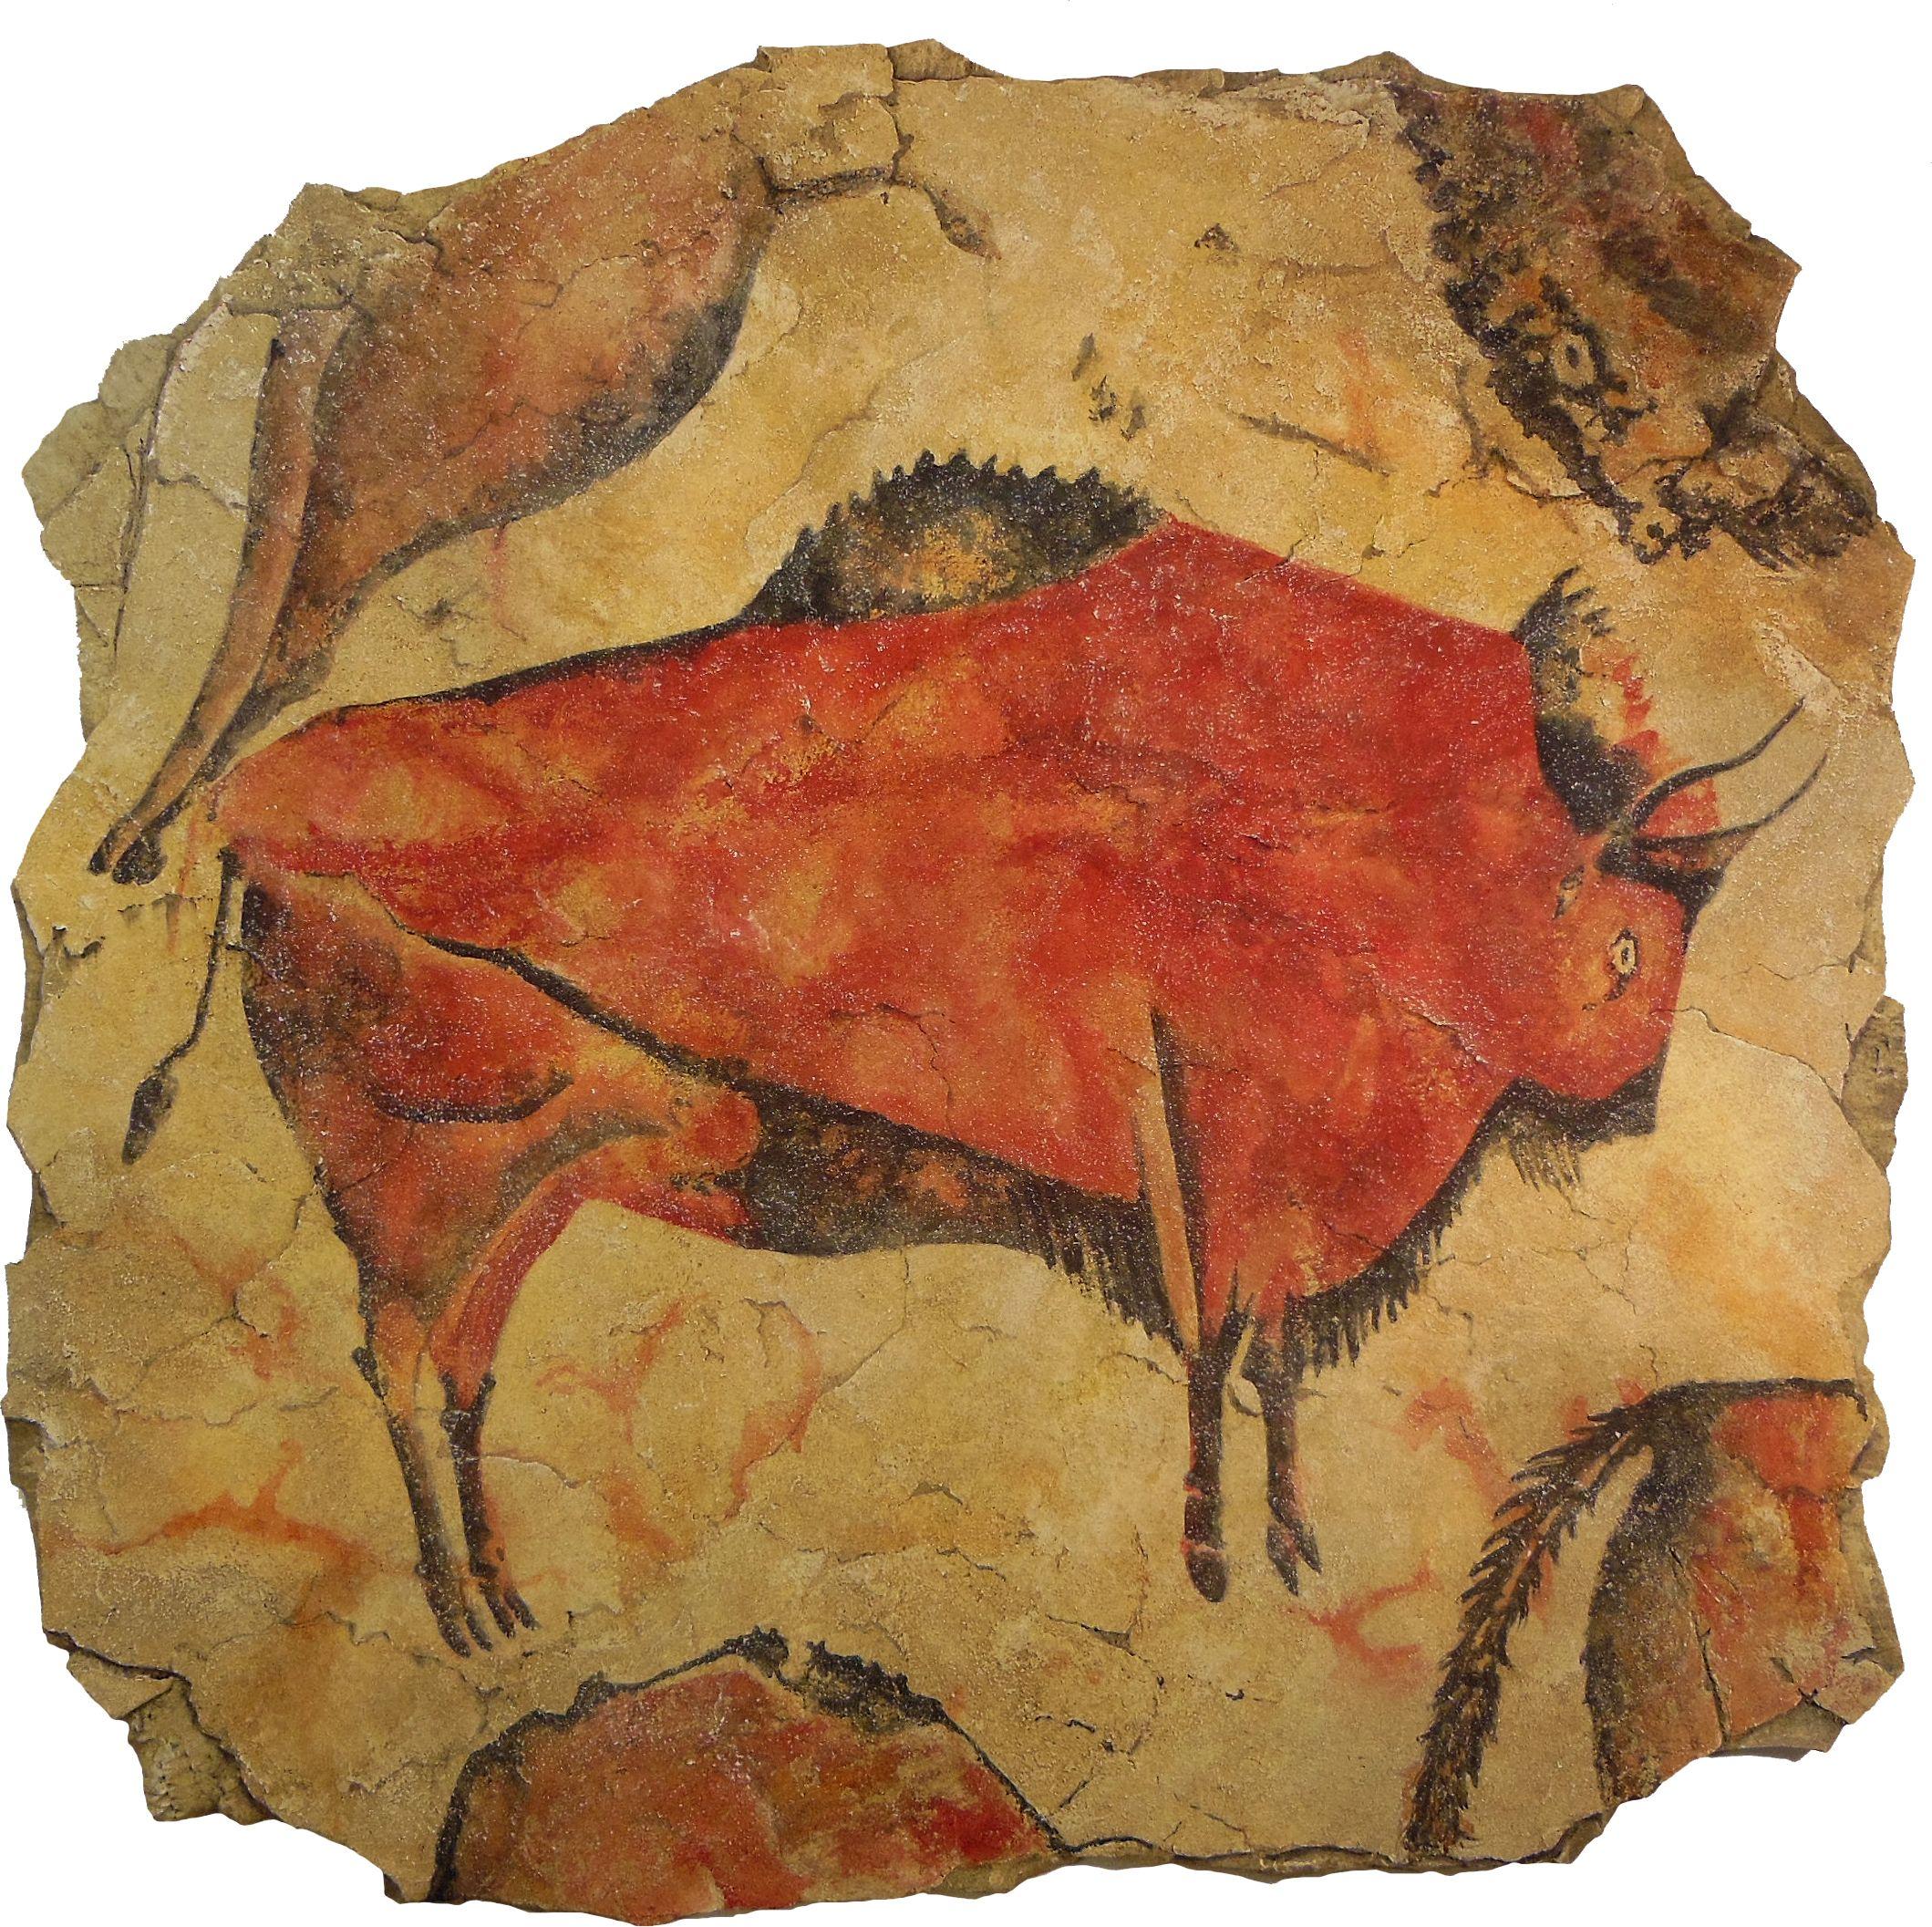 Altamire Bison Altamira Cave Village Of Antillana Del Mar Cantabria Spain 16 000 To 9 000 B C Cave Paintings Prehistoric Cave Paintings Painting